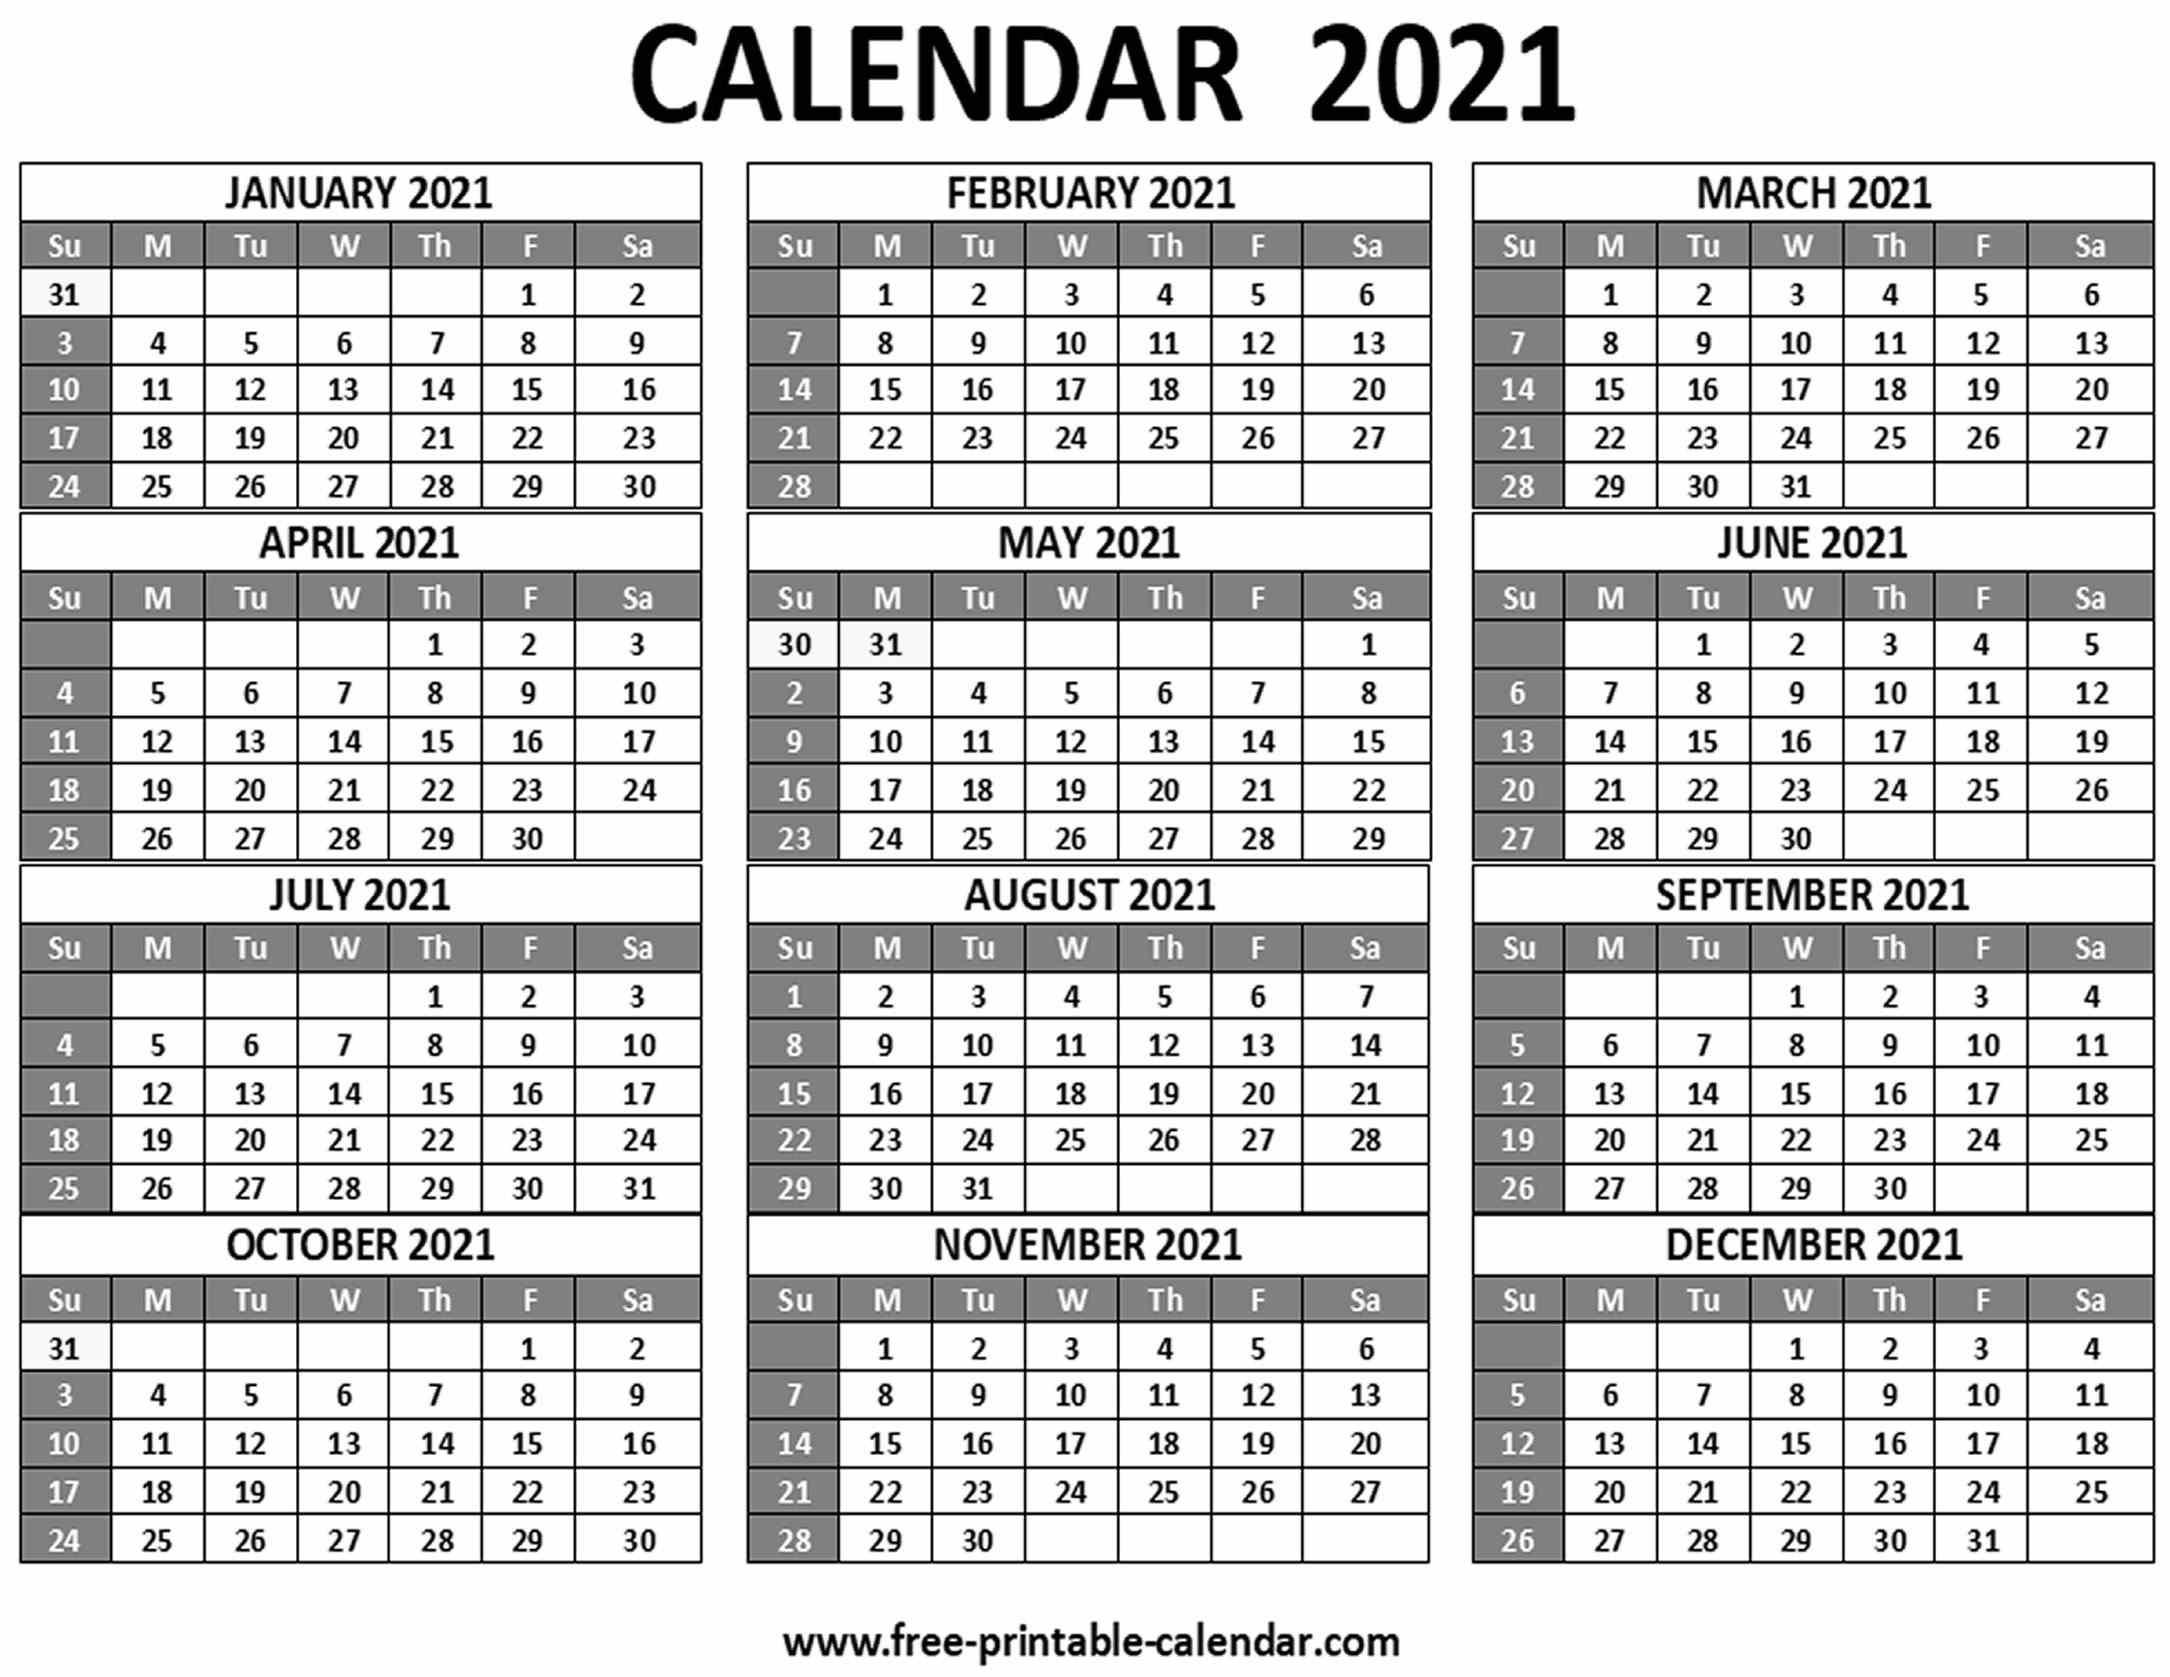 Printable 2021 Calendar - Free-Printable-Calendar